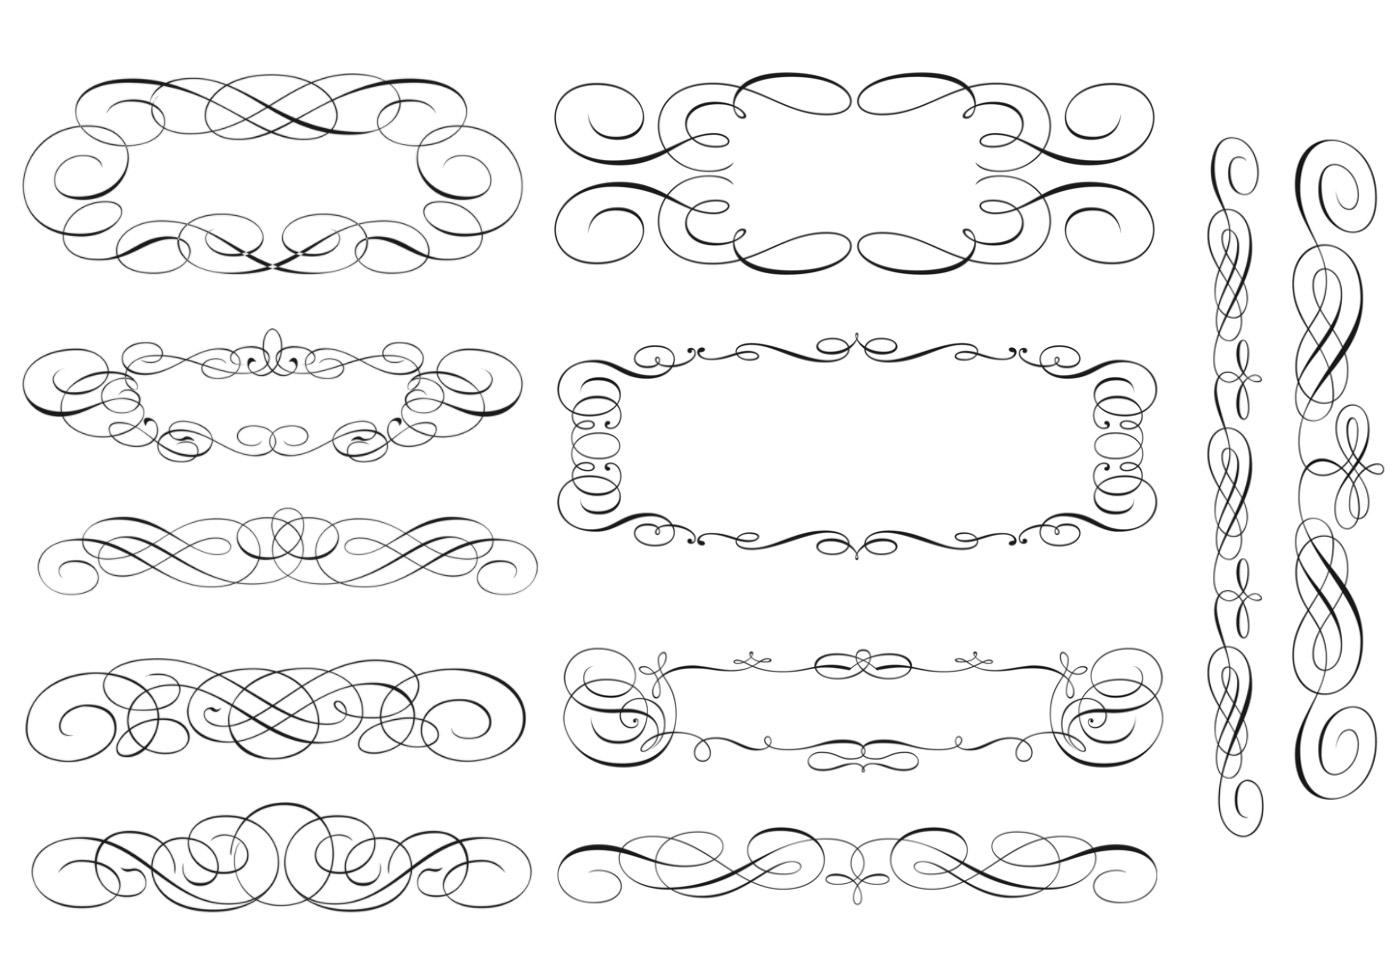 Swirly Scroll Frame and Border Brushes - Free Photoshop Brushes at ...